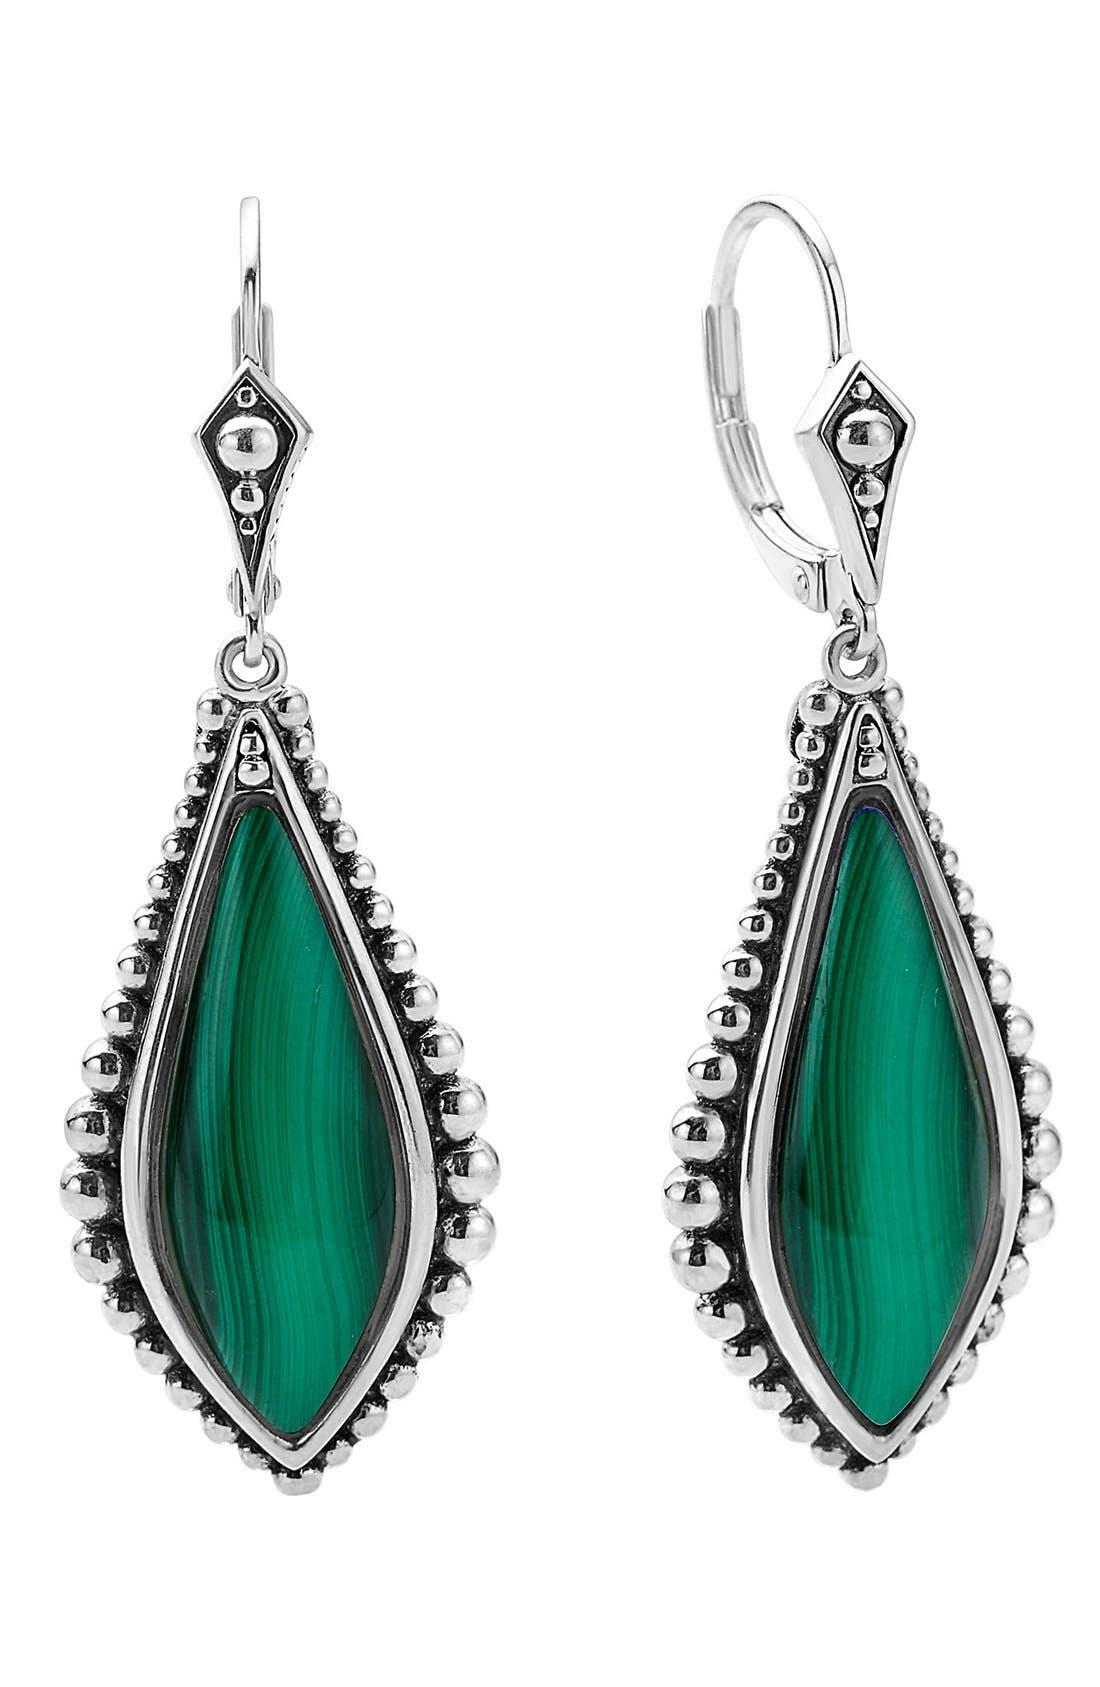 LAGOS 'Contessa' Semiprecious Stone Drop Earrings, Main, color, MALACHITE